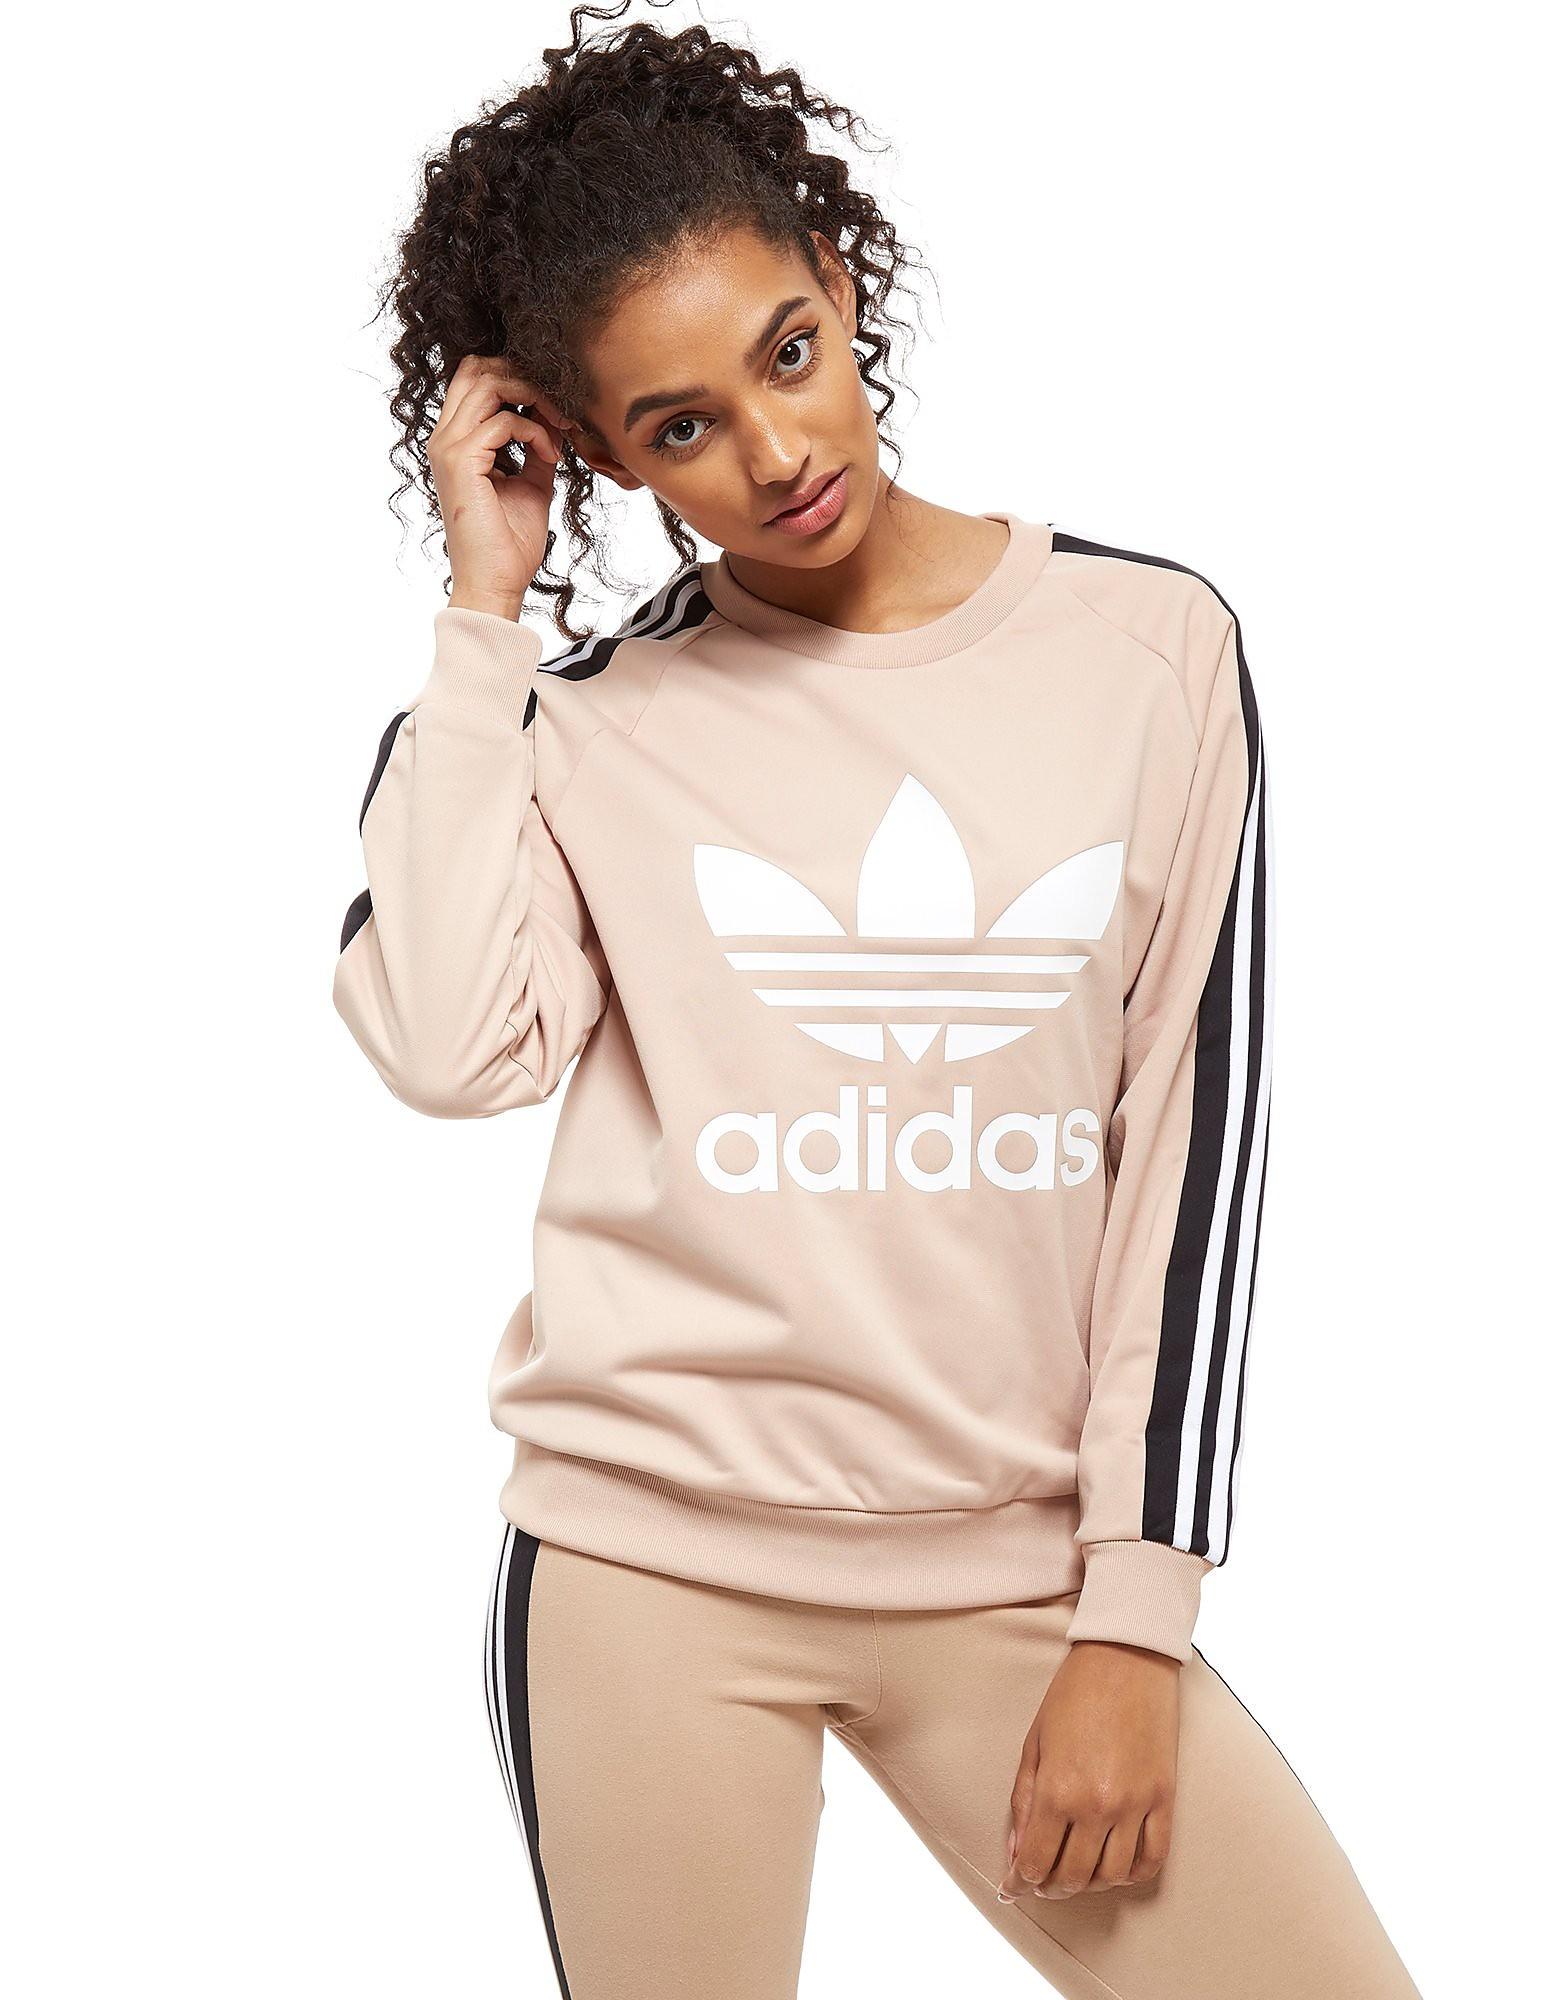 adidas Originals 3-Stripes Panel Crew Sweatshirt